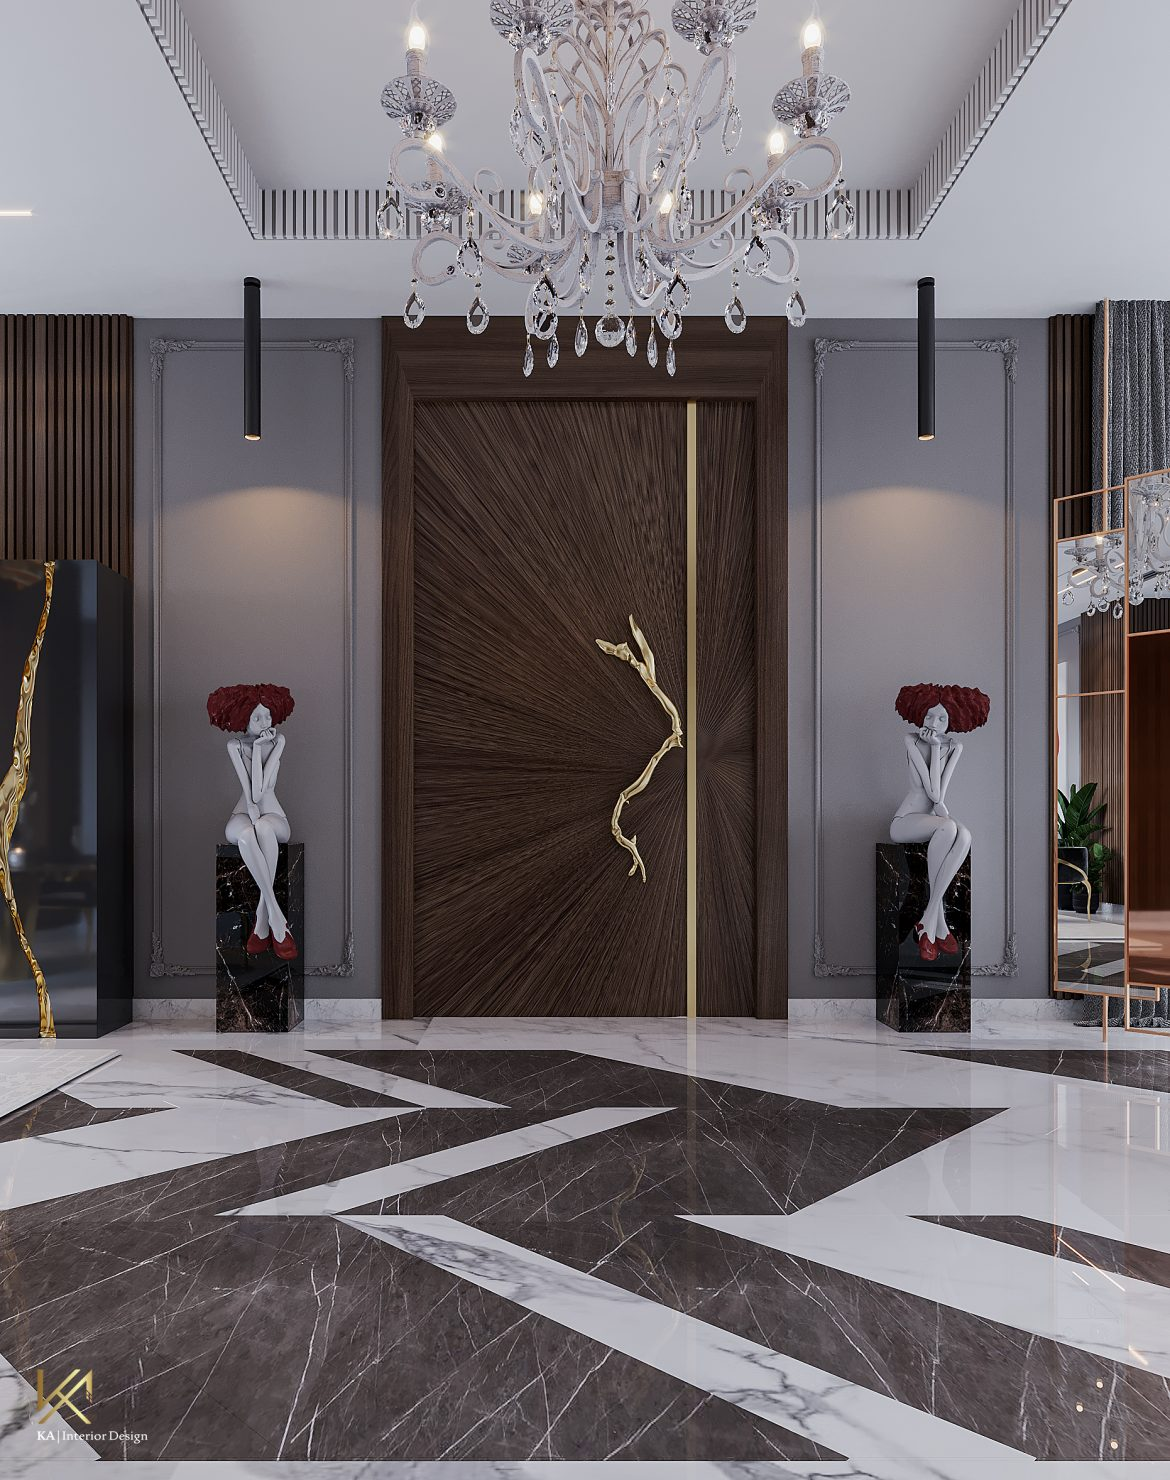 Covet House x K.A Interior Design: A Opulent Modern Classic Villa in Riyadh  Covet House x K.A Interior Design:  A Opulent Modern Classic Villa In Riyadh covet house k a interior design lavish modern classic villa riyadh 4